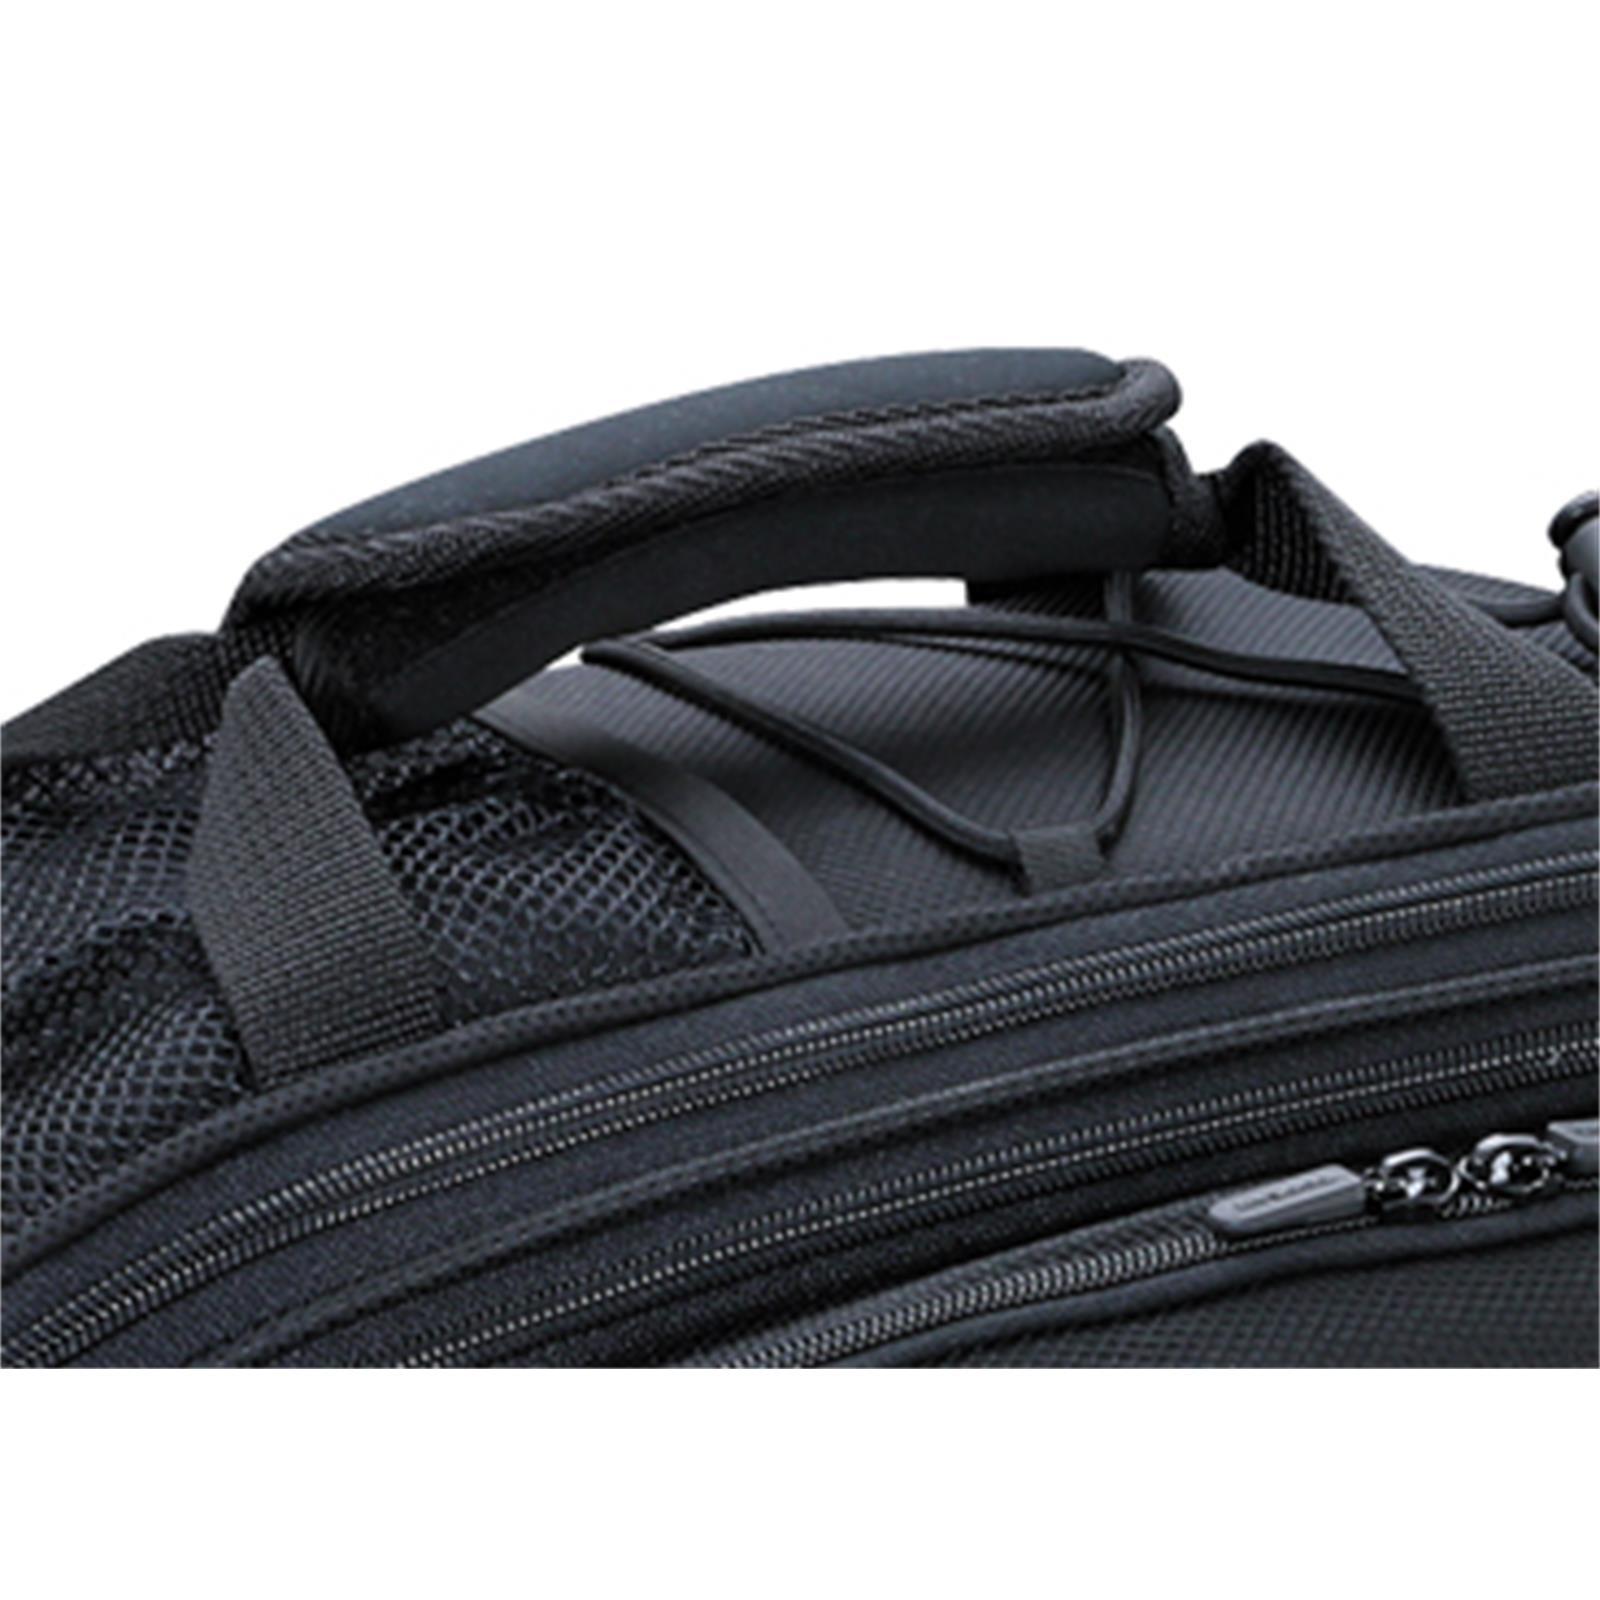 Topeak Mtx Trunk Bag Bolso Bicicleta Cesto Portaequipaje